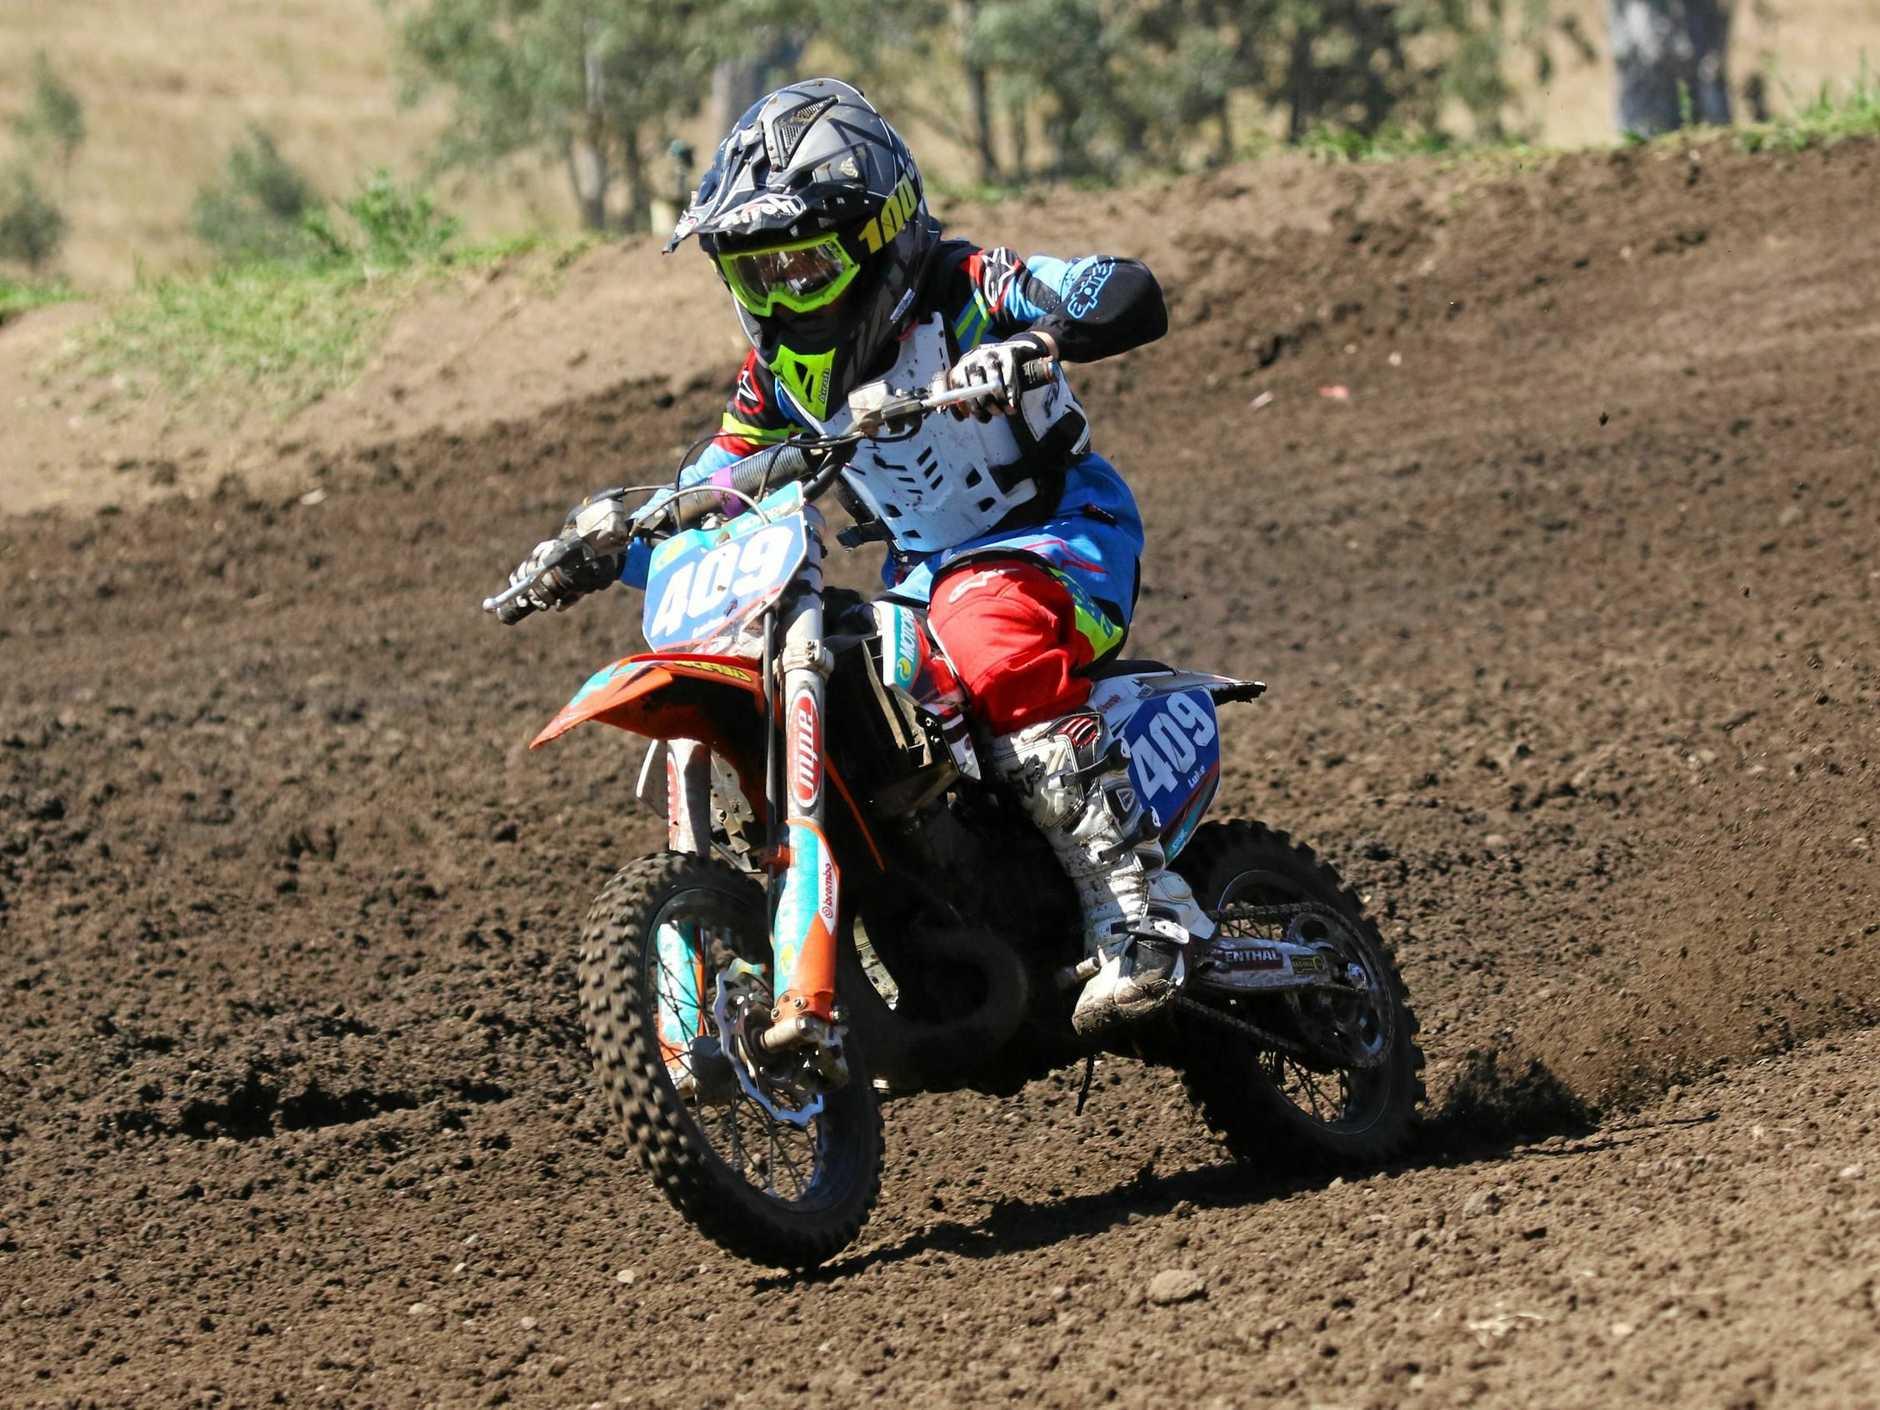 SPEEDSTER: Gympie motocross rider Luke Constantine is aiming for top spot at this month's KTM Australian Junior MotoX titles in Horsham, Victoria.